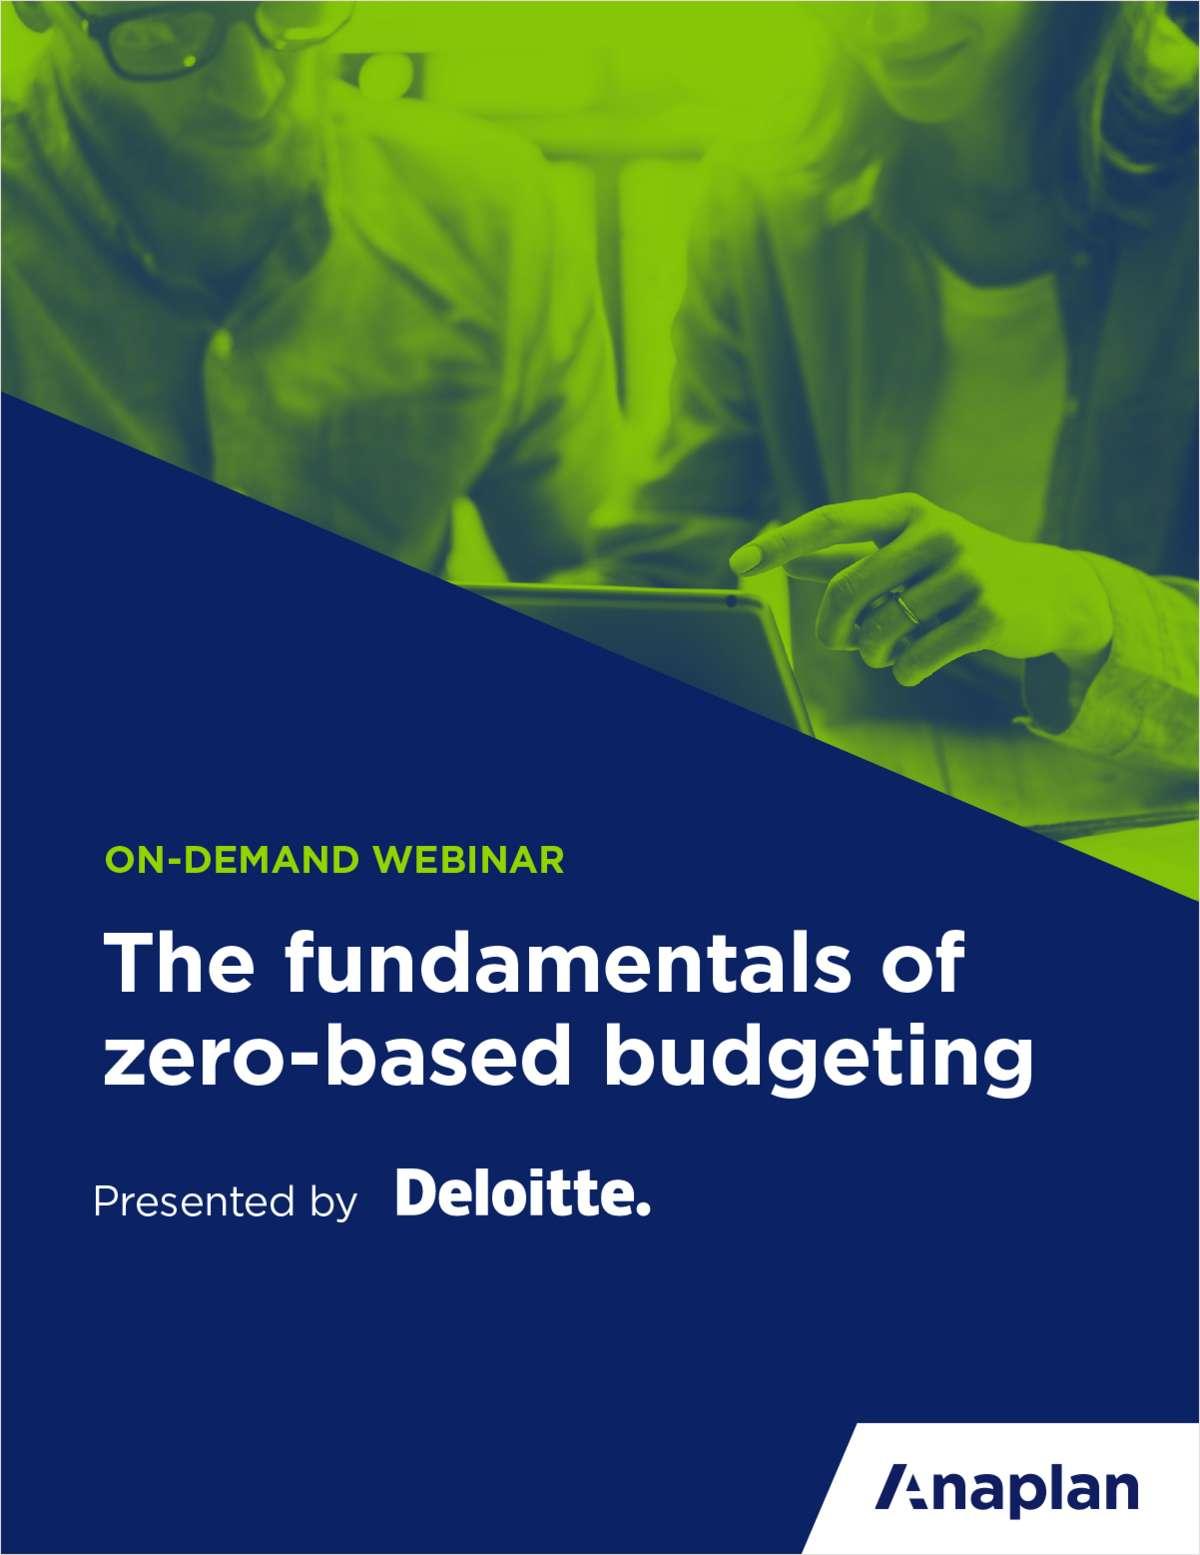 The Fundamentals of Zero-Based Budgeting